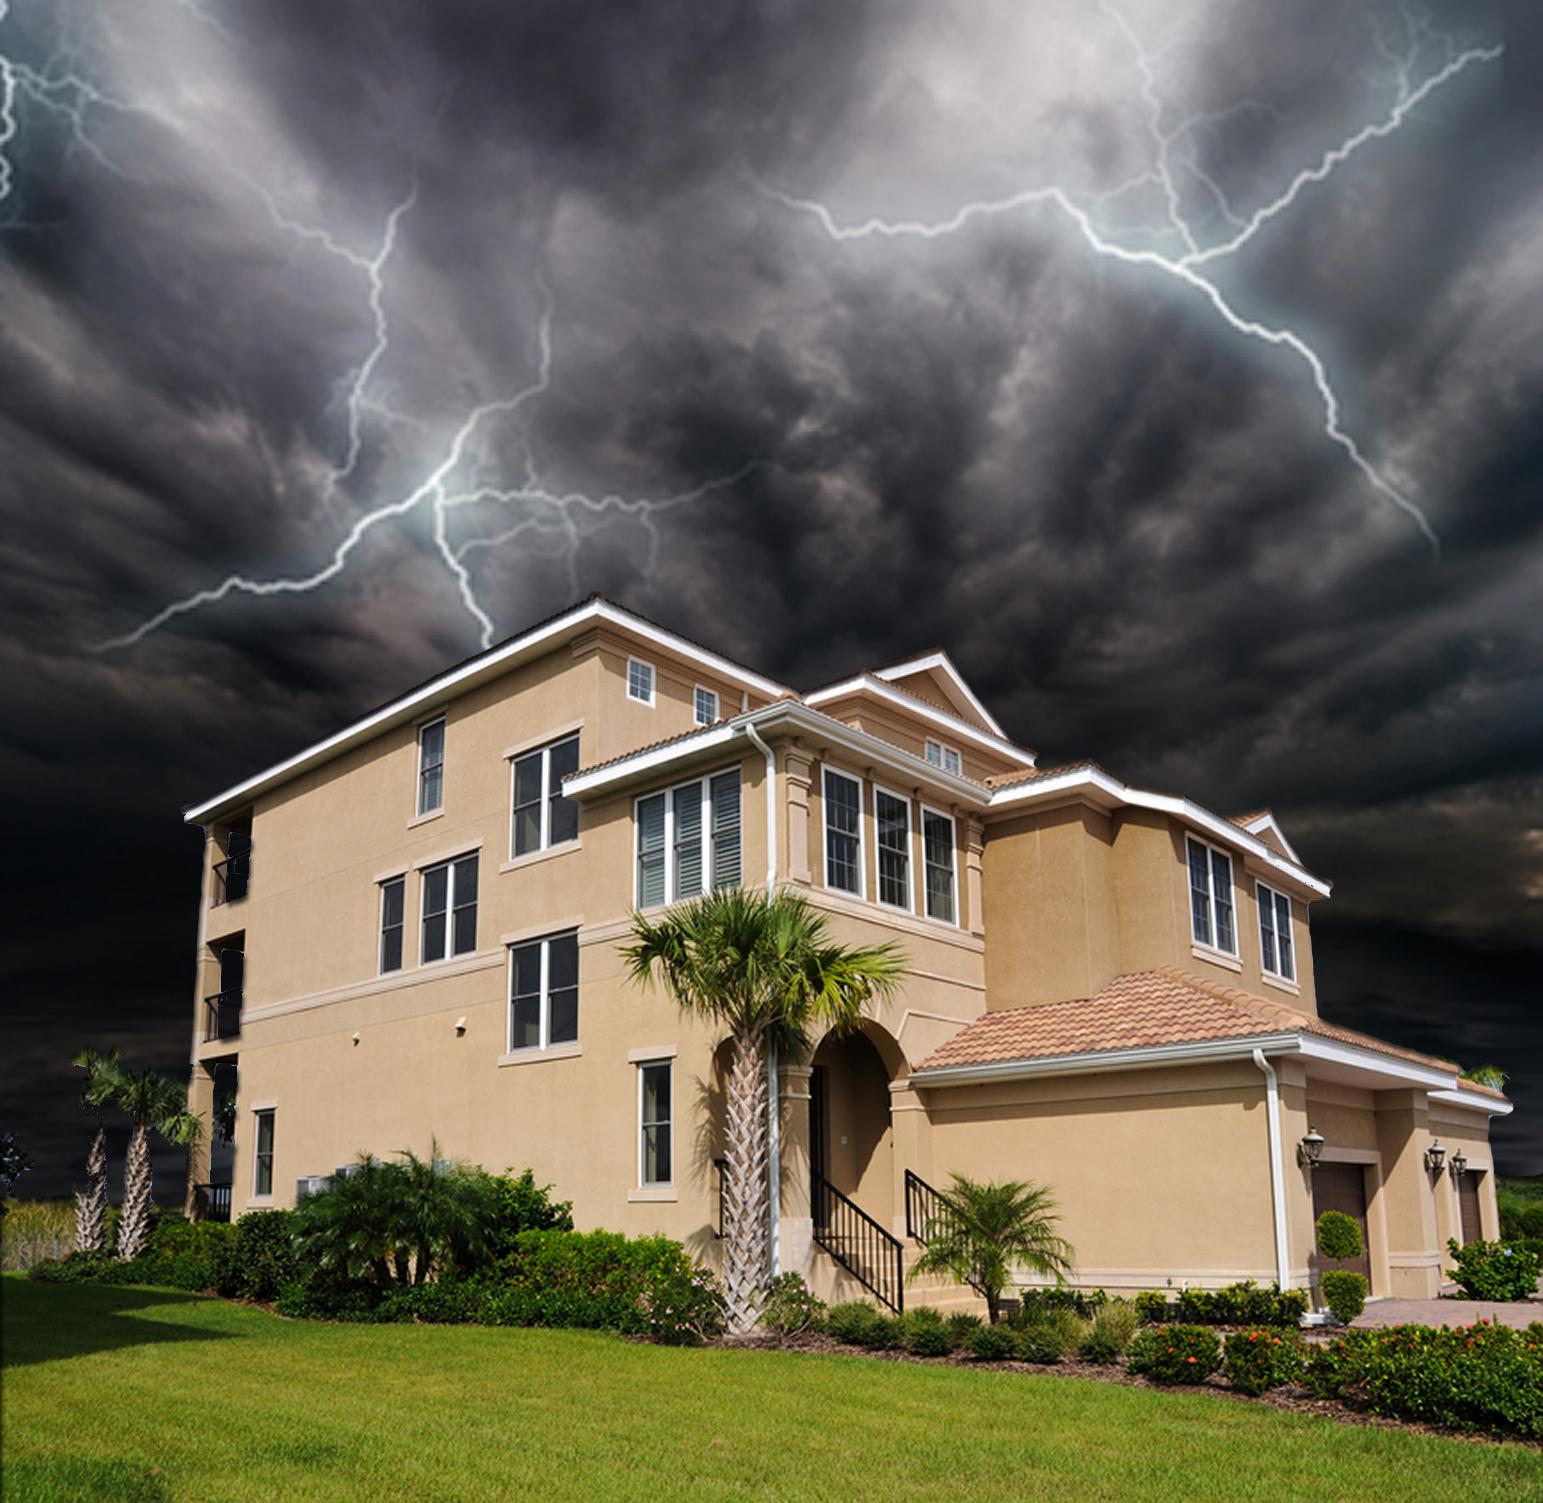 Emergency Roof Repair Contractors Northern Virginia